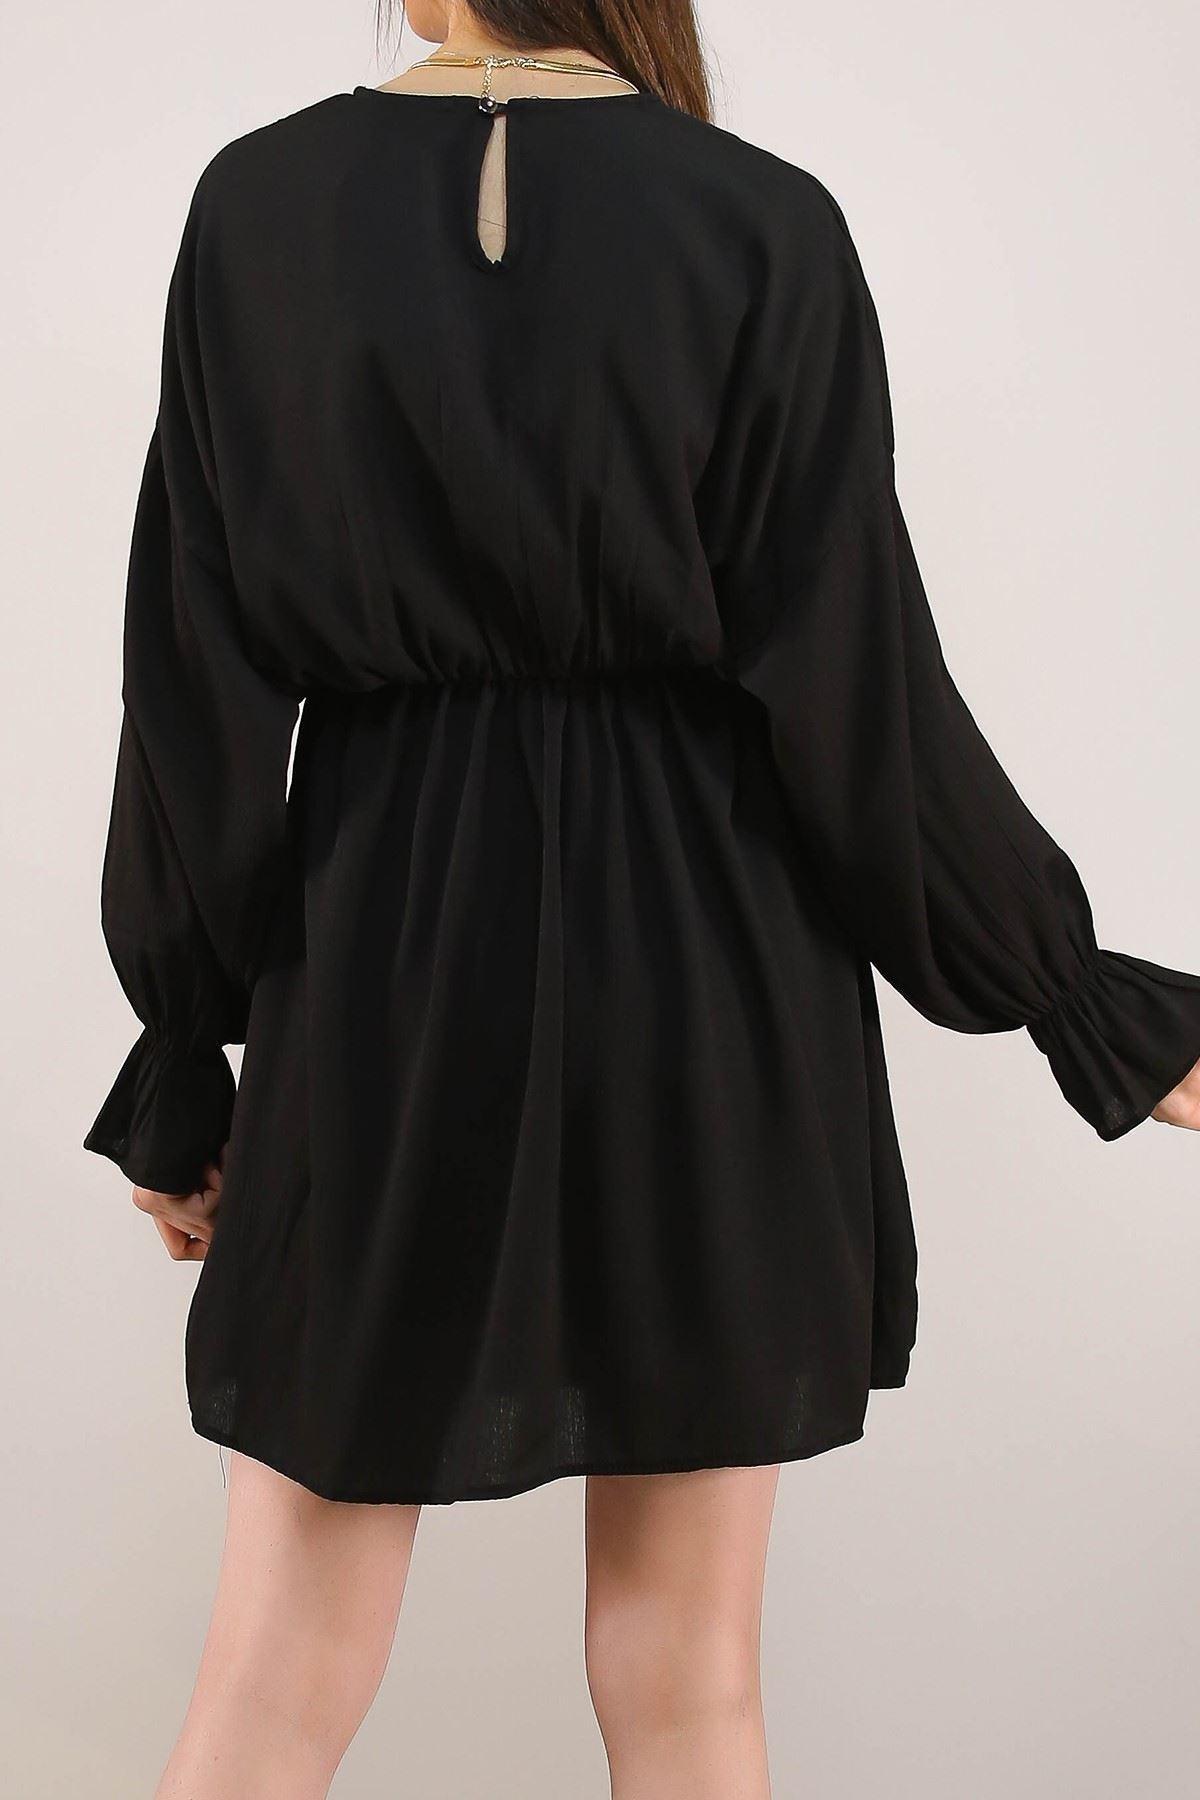 Dokuma Elbise Siyah - 5071.701.